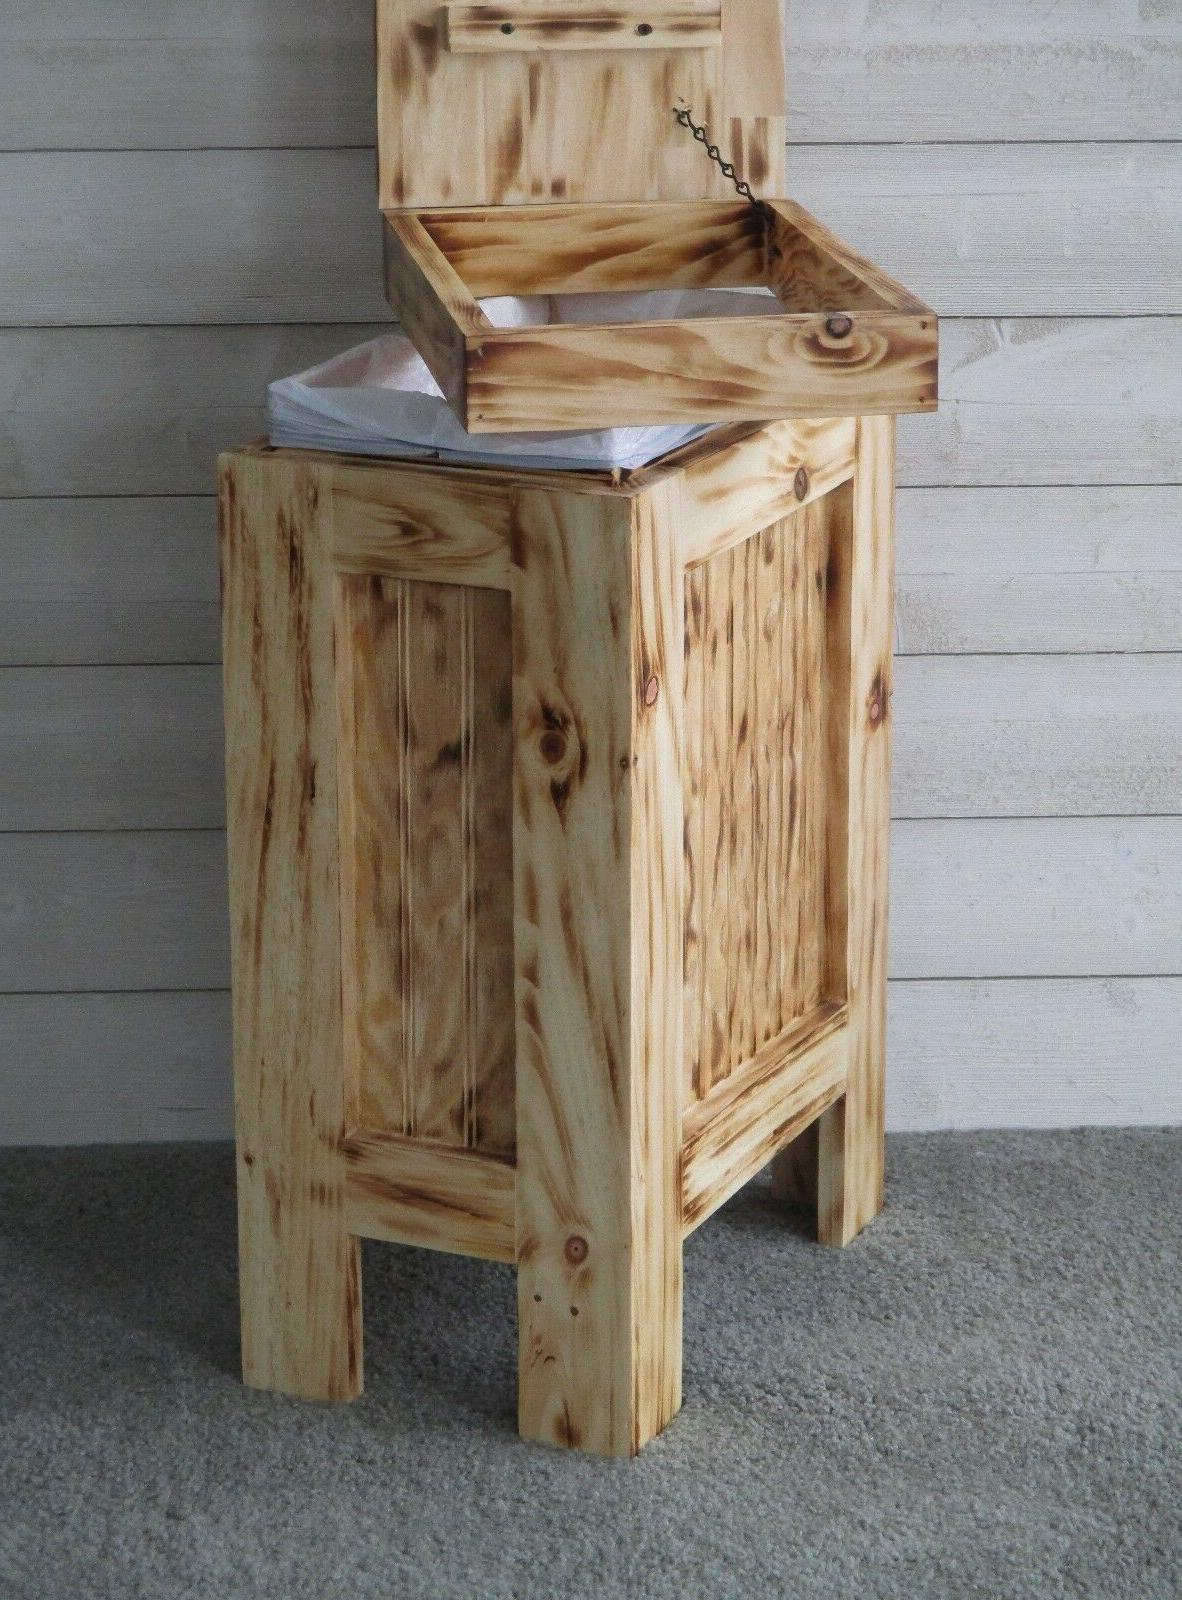 Wood Trash Can Garbage Trash Burnt ROPE